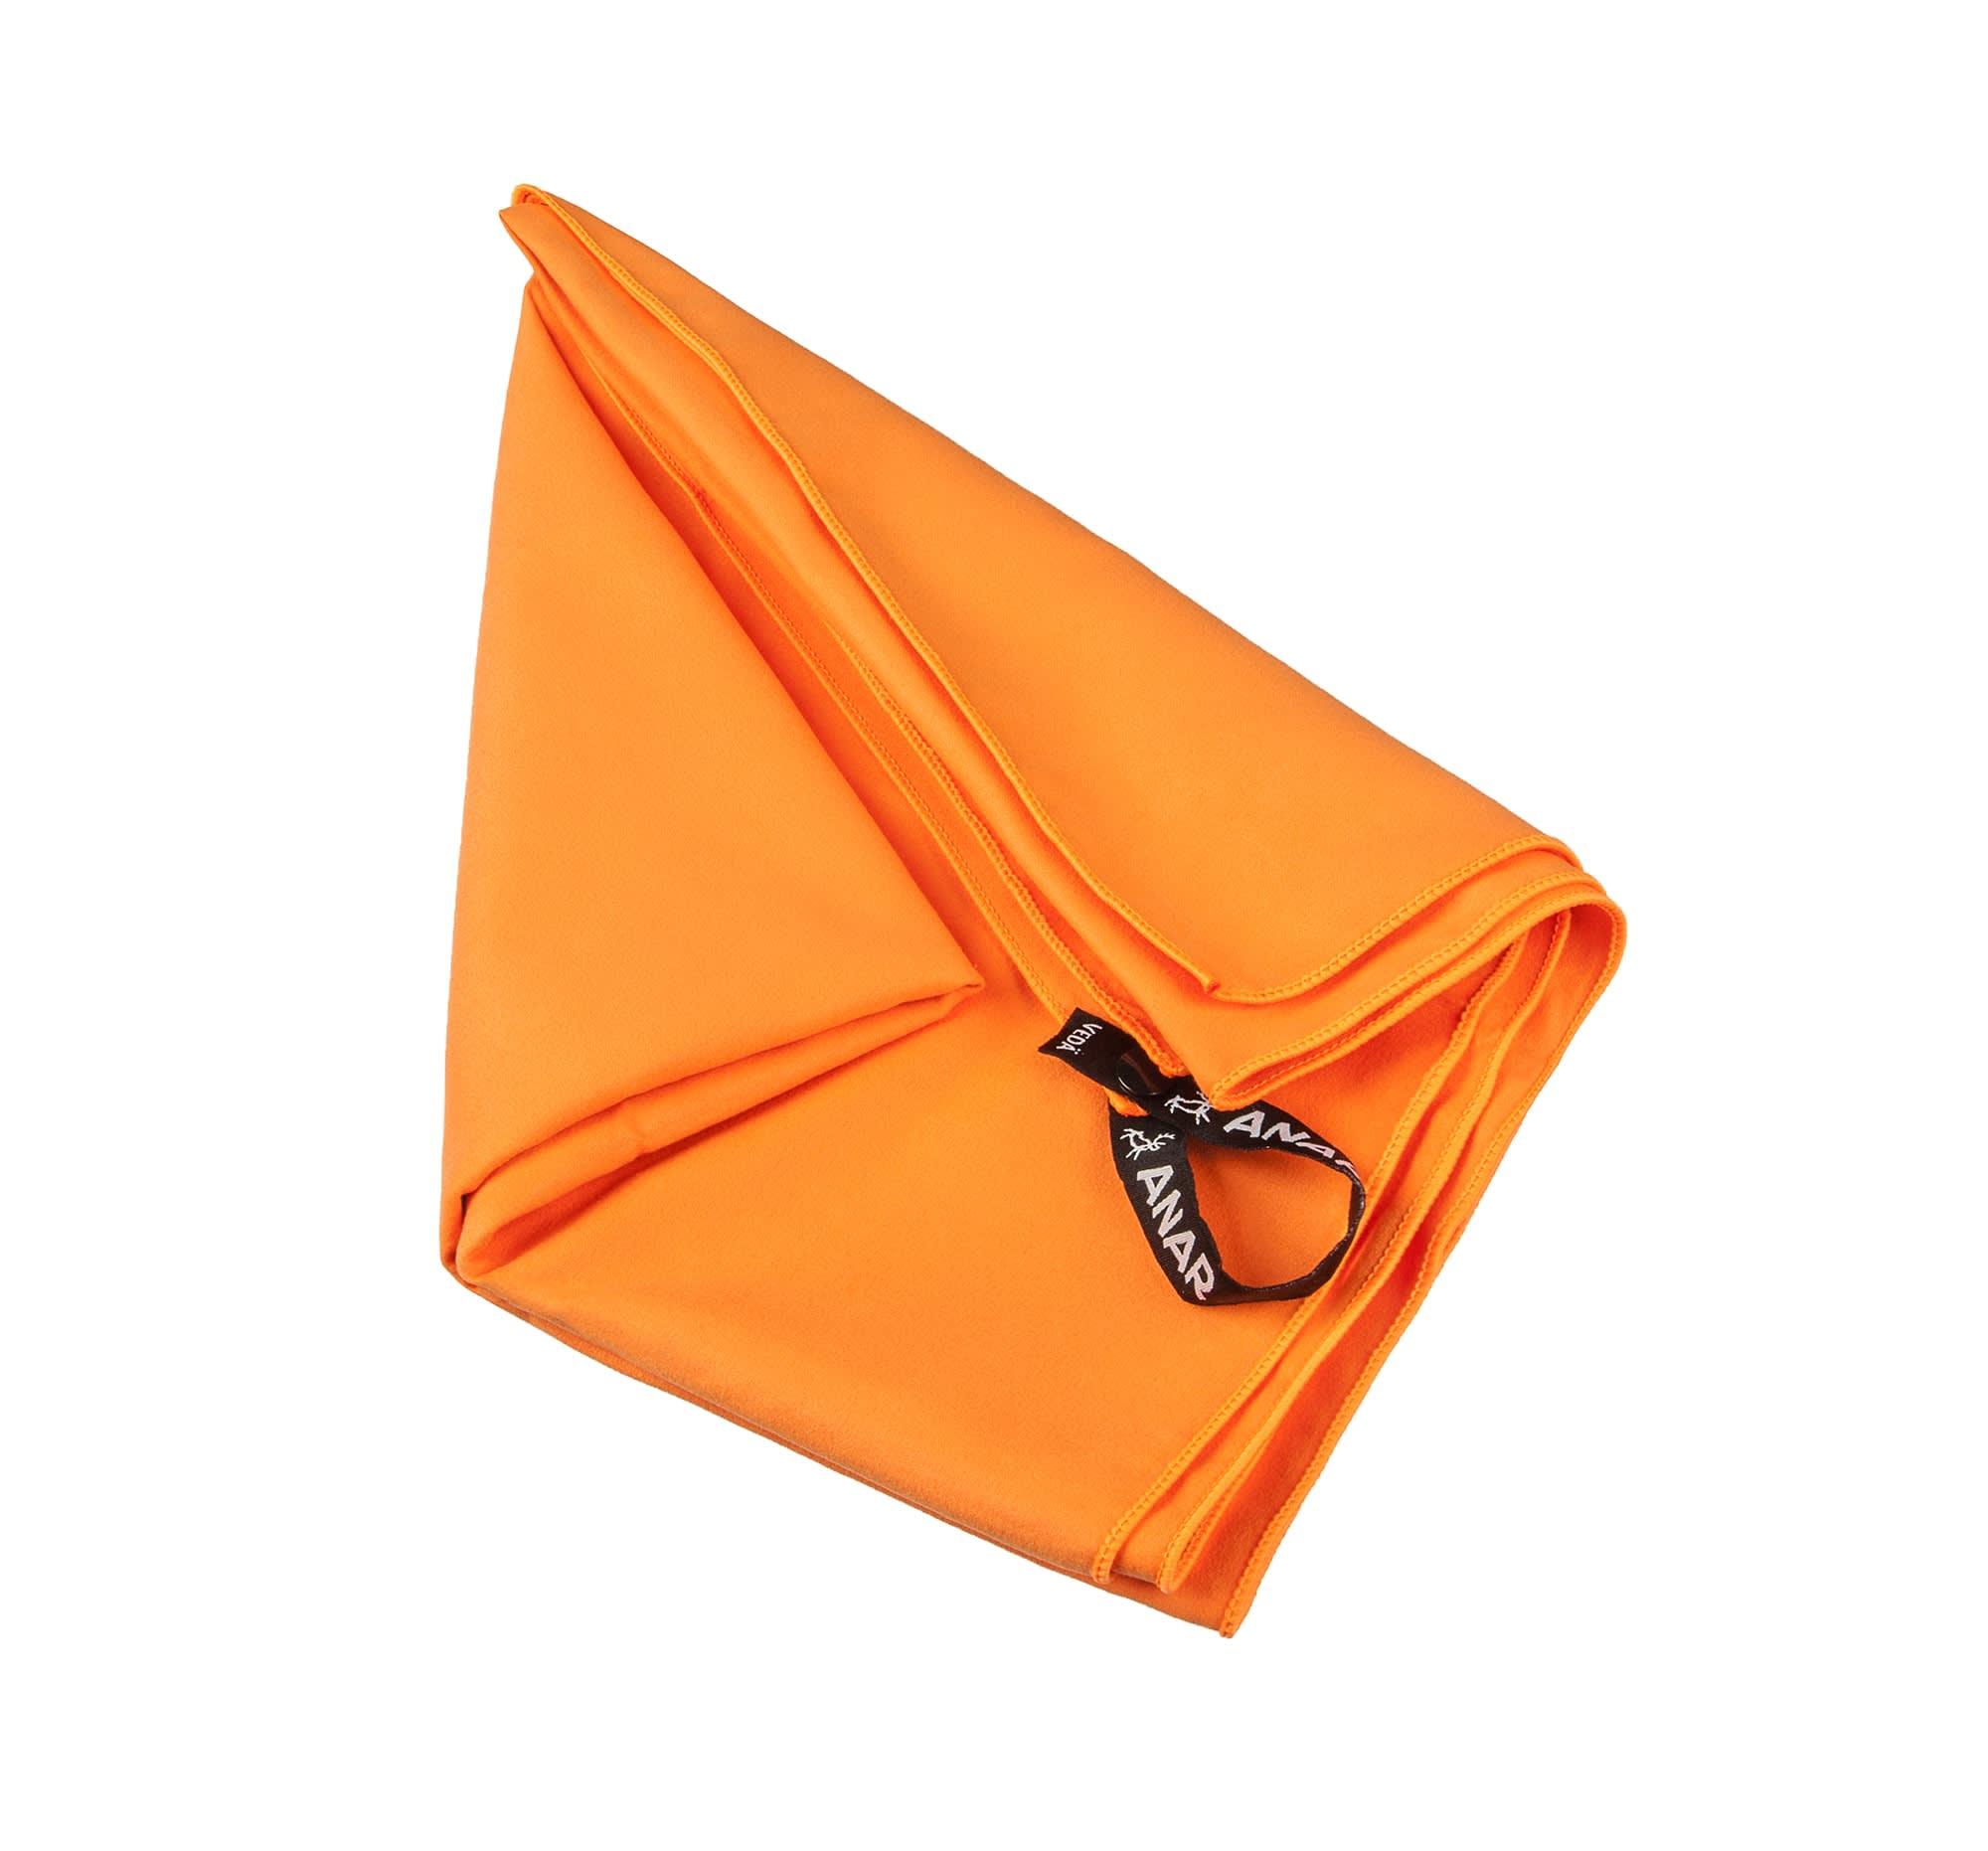 Cocoon Microfiber Terry Towel matkapyyhe useita värejä